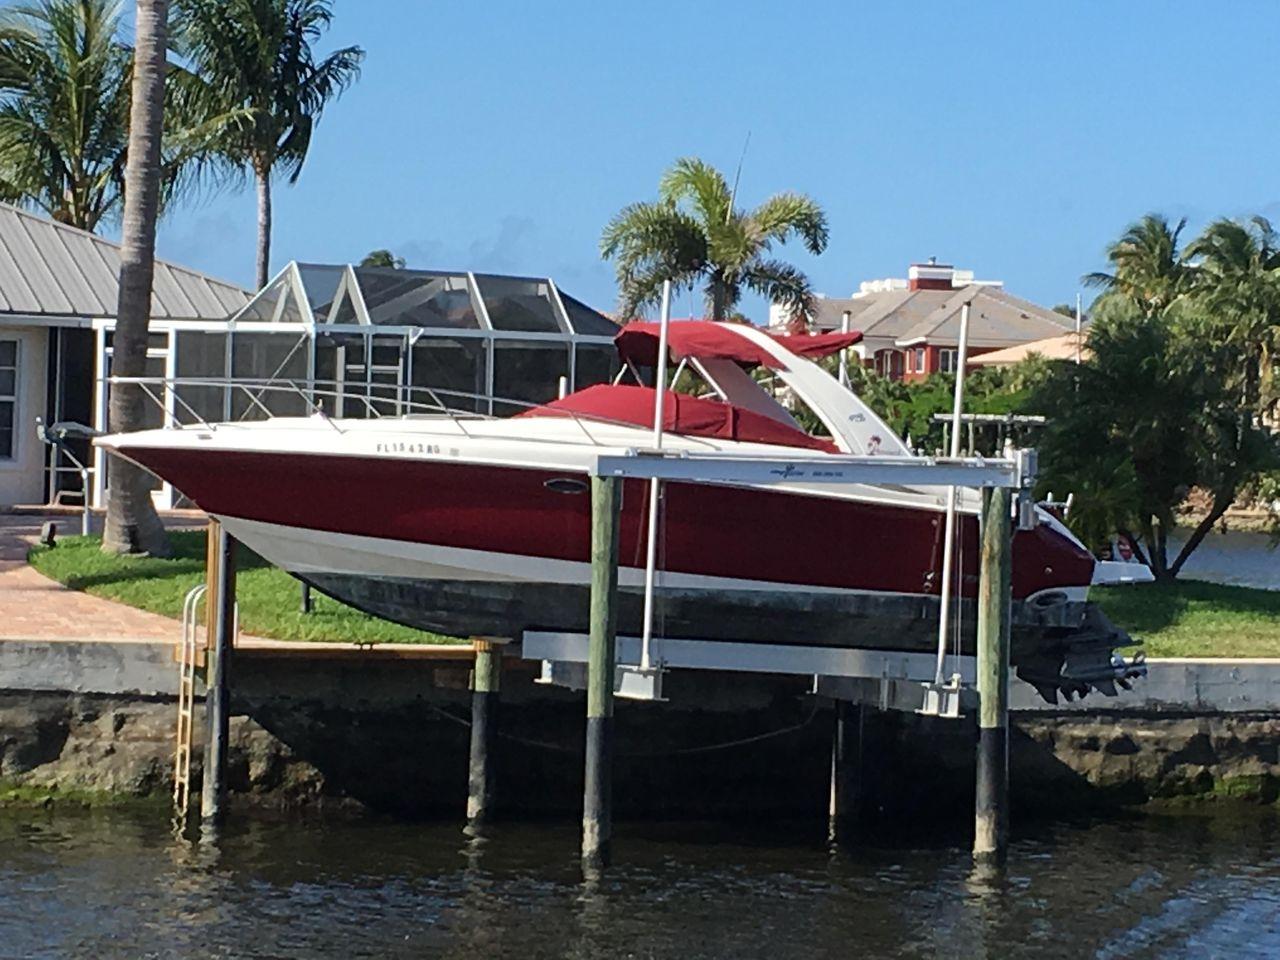 4a4880e4 2007 Used Monterey 298 SC Sports Cruiser Boat For Sale - $62,900 ...